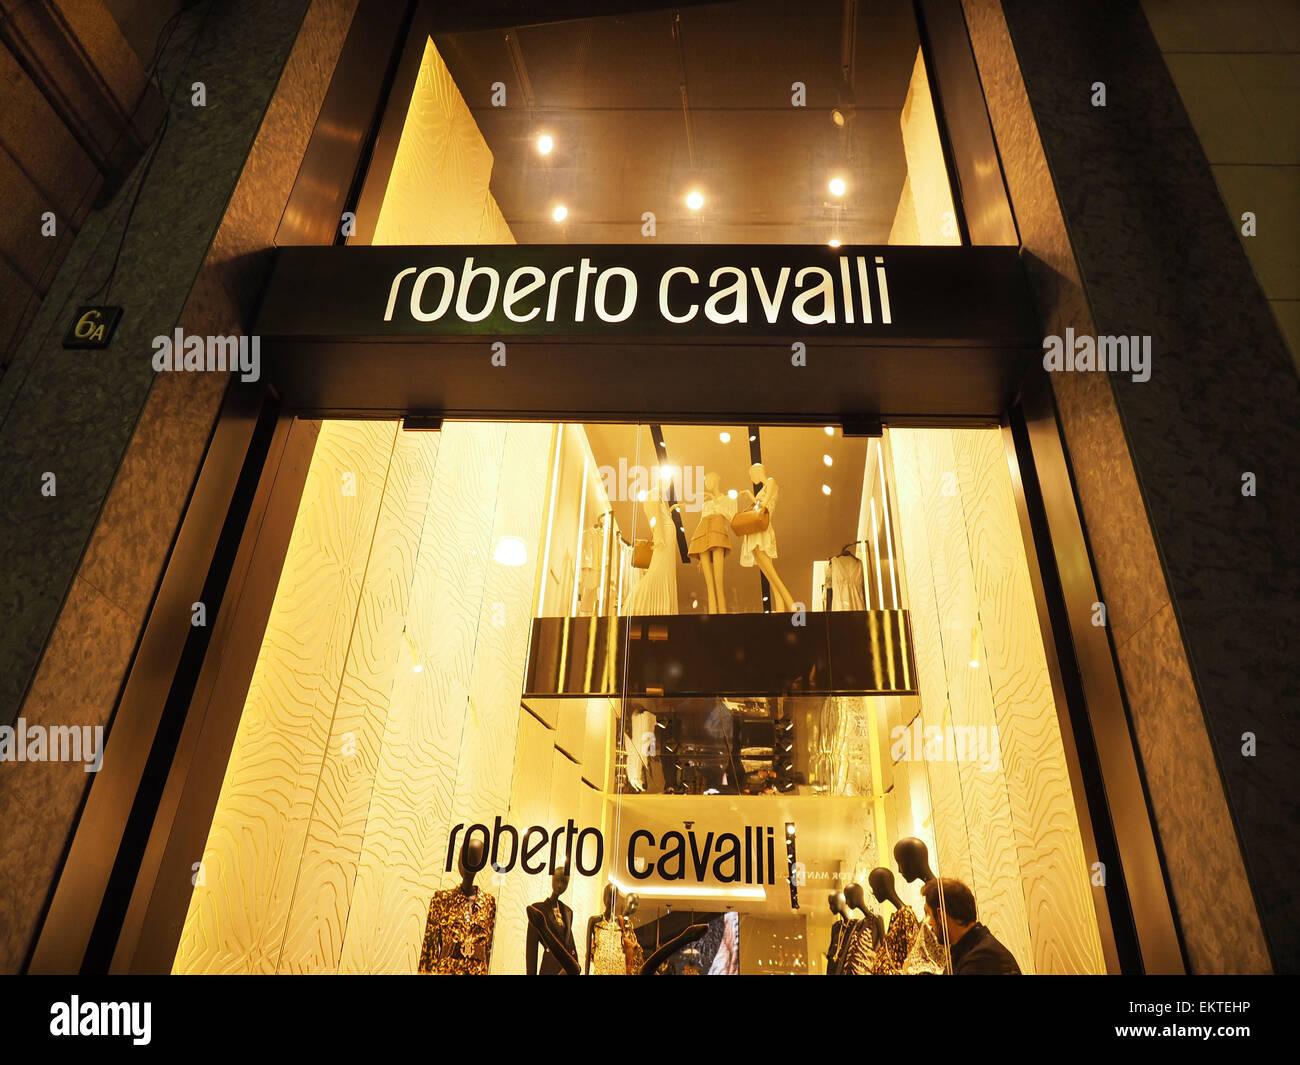 Roberto Cavalli store, Via Montenapoleone street, Milan, Lombardy, Italy, Europe Stock Photo